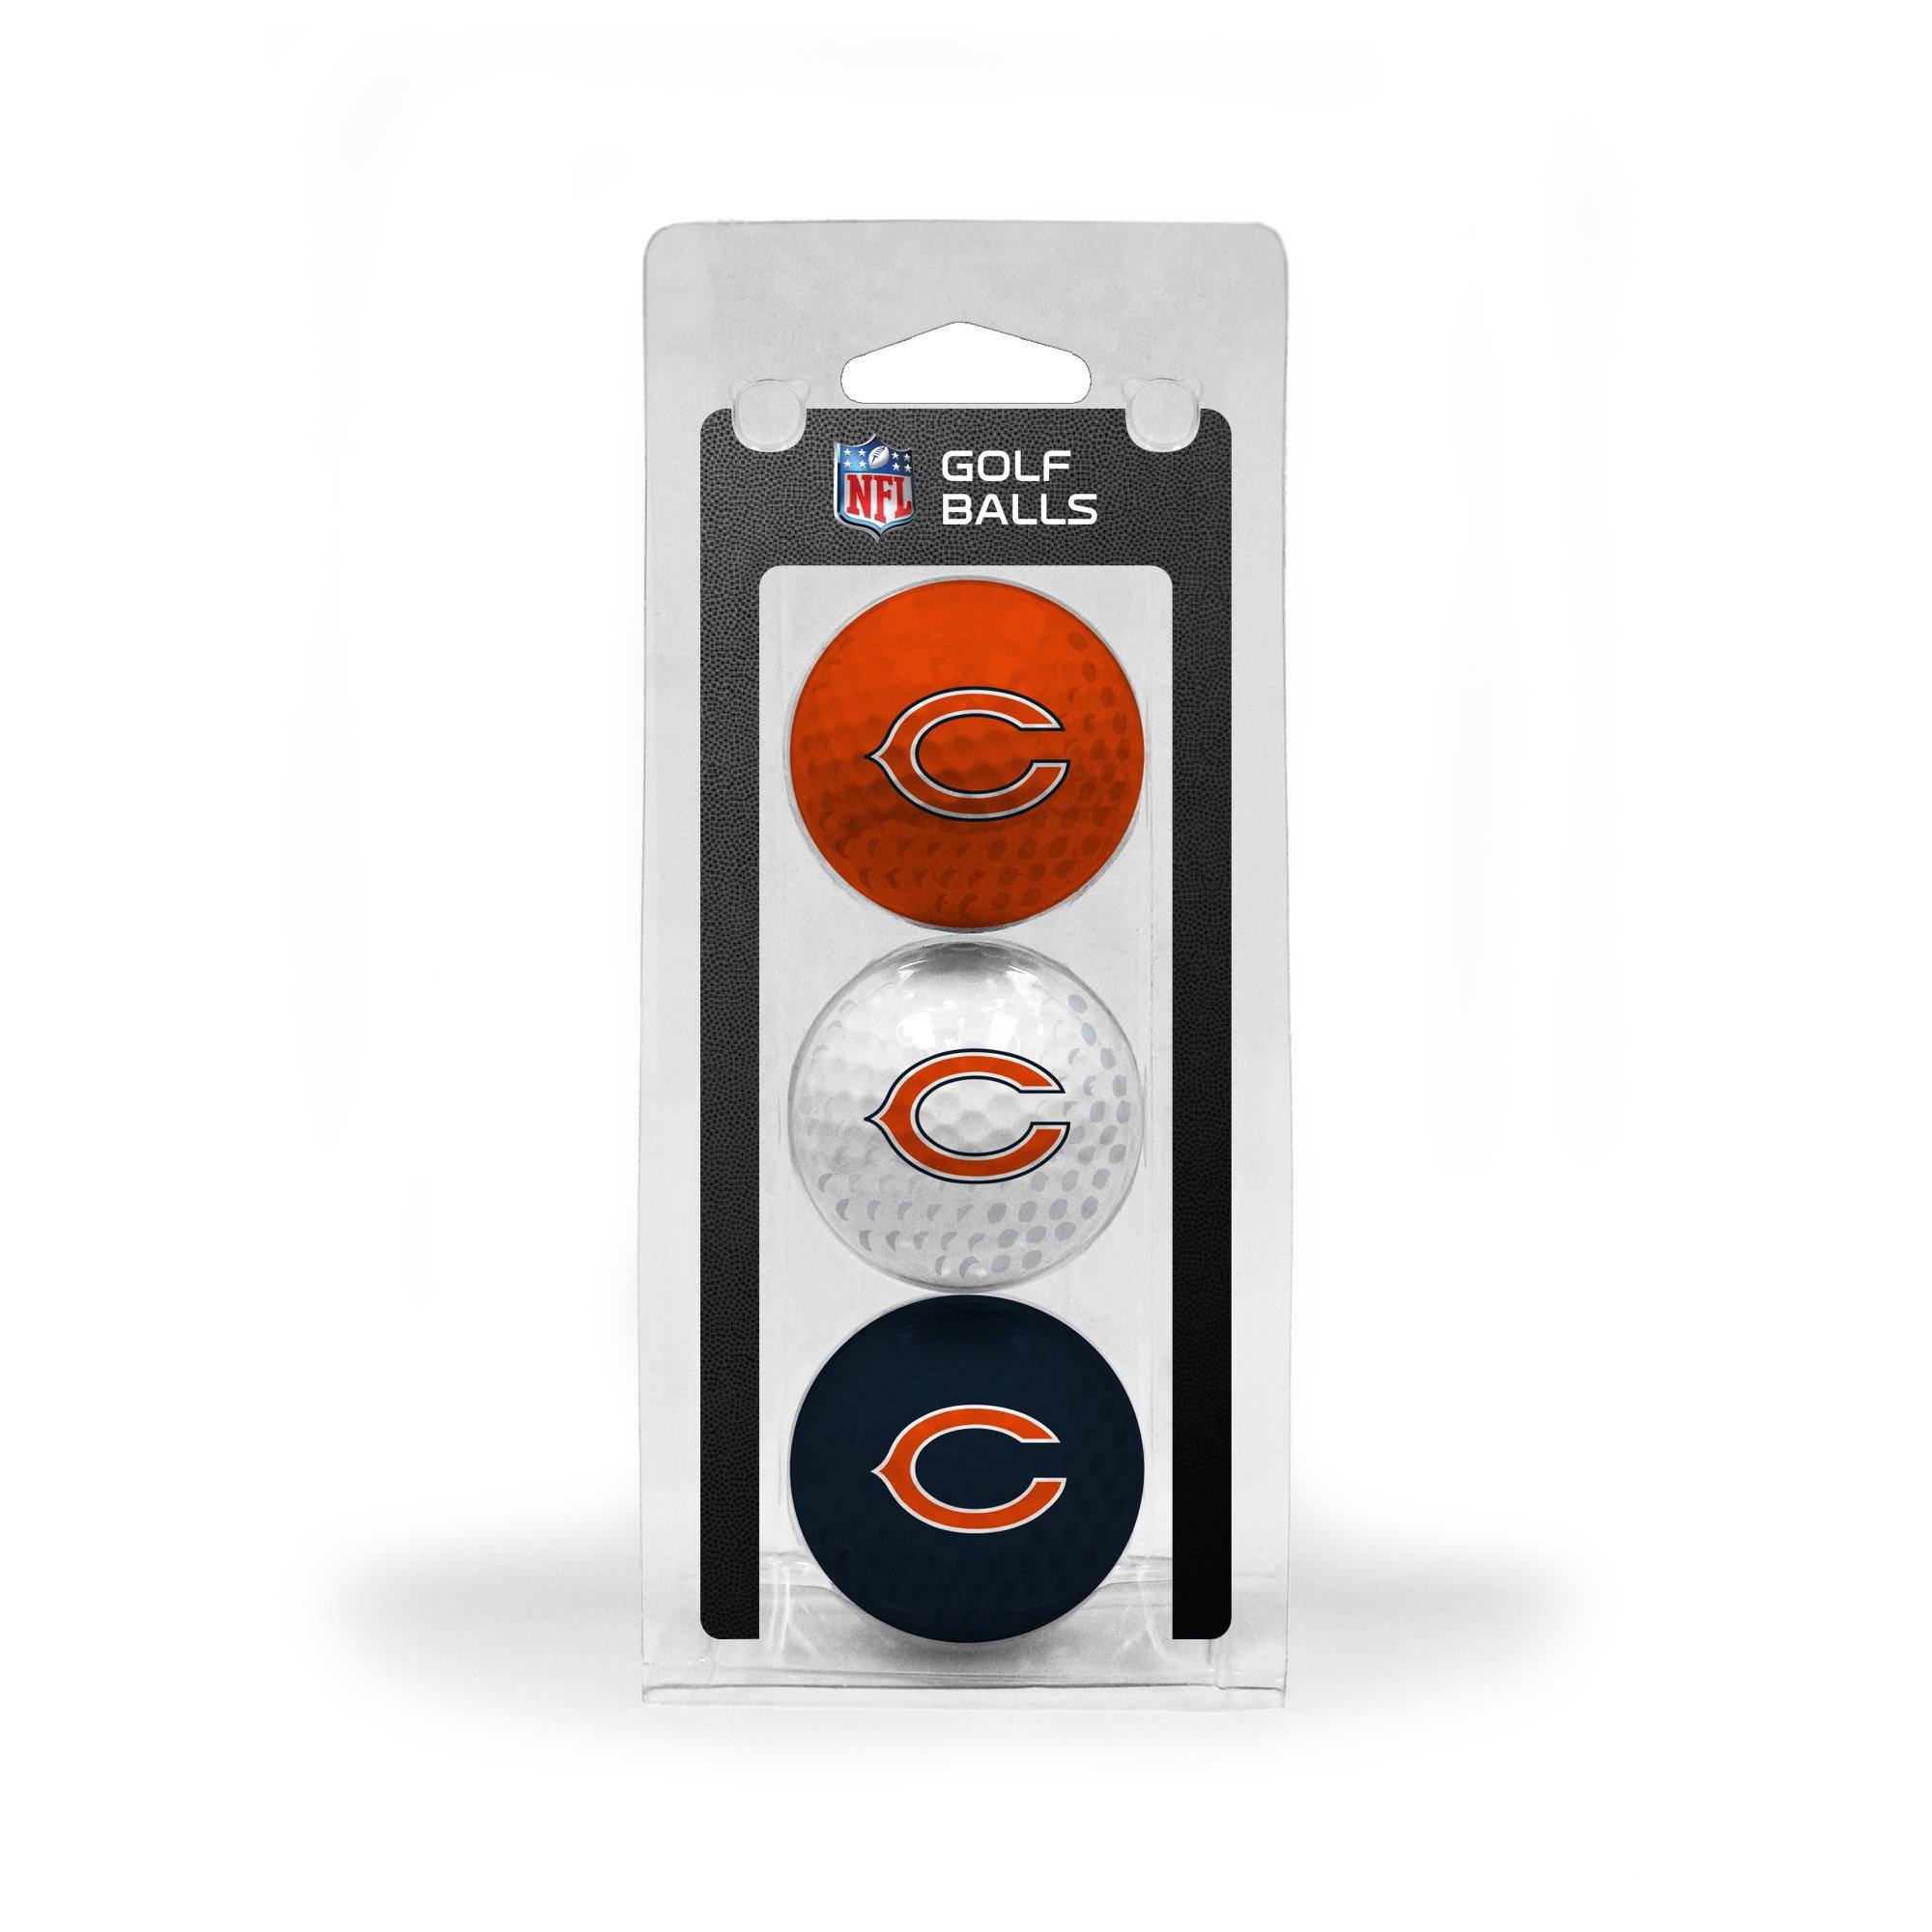 Team Golf NFL Chicago Bears Regulation Size Golf Balls, 3 Pack, Full Color Durable Team Imprint